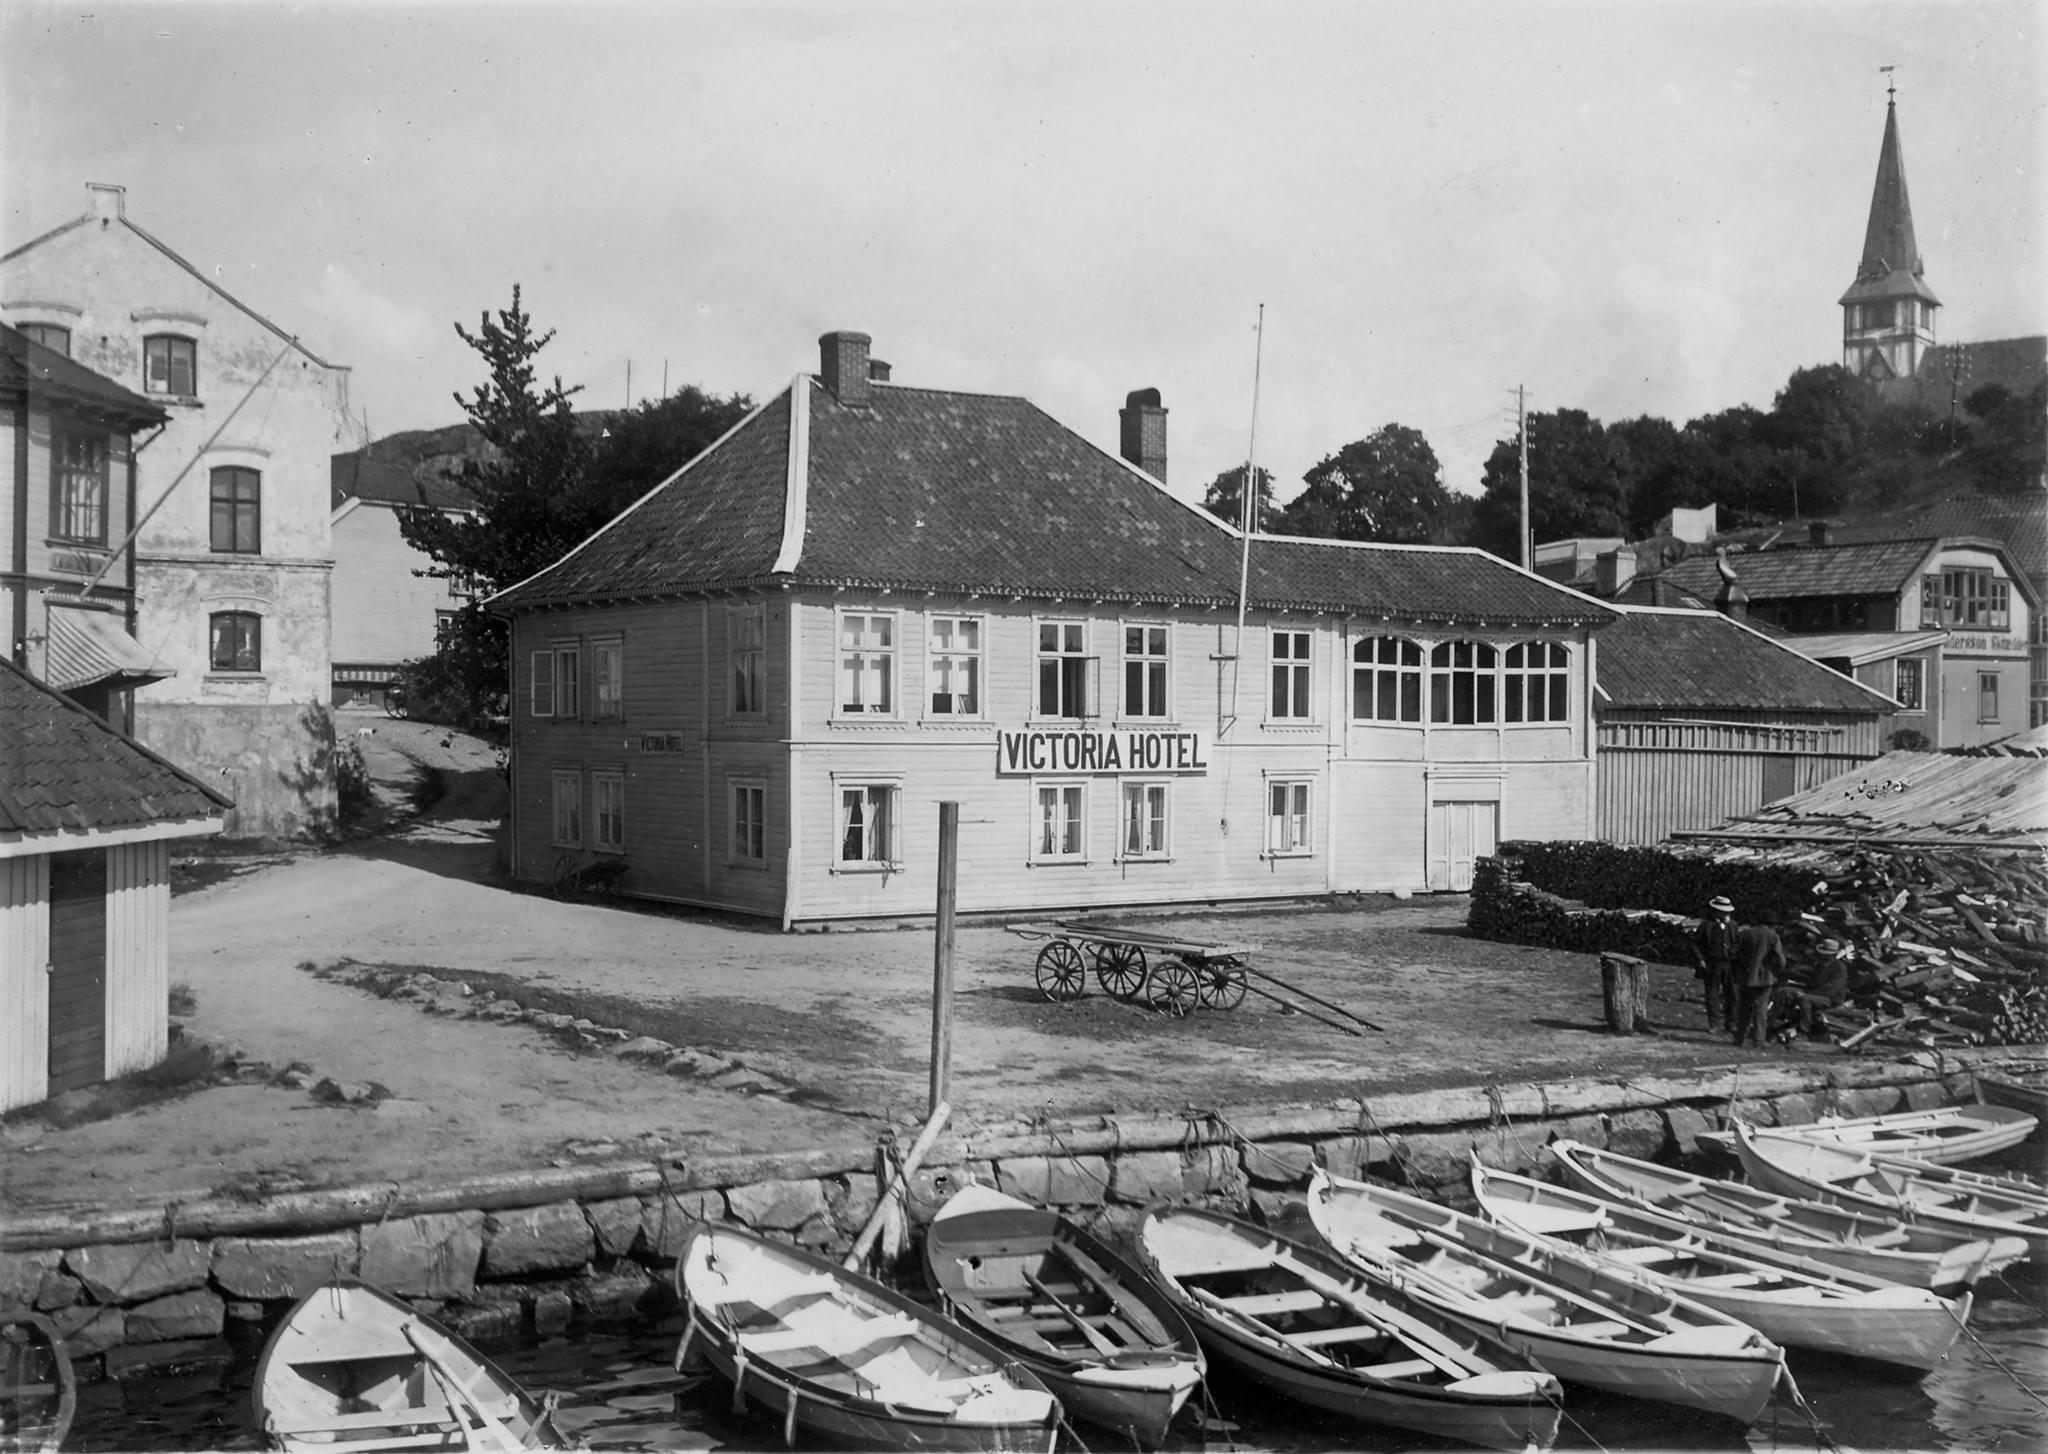 Victoria Hotel, Strandgate 38, Grimstad